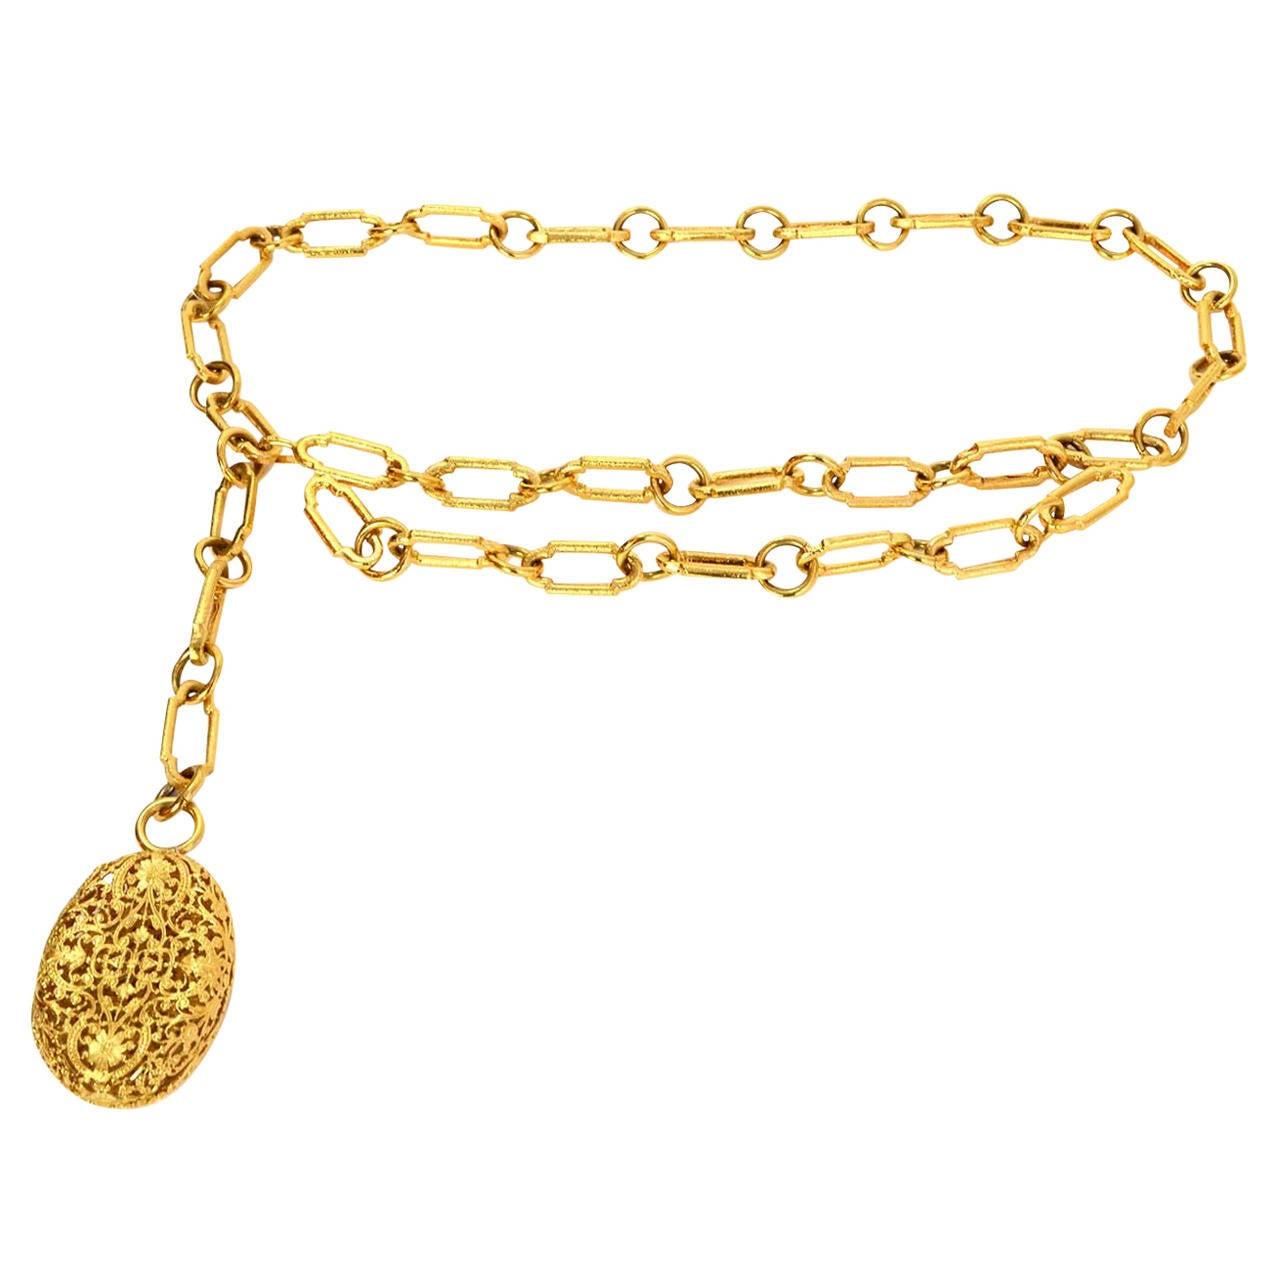 CHANEL Gold Chain Link Filigree Medallion Belt 1